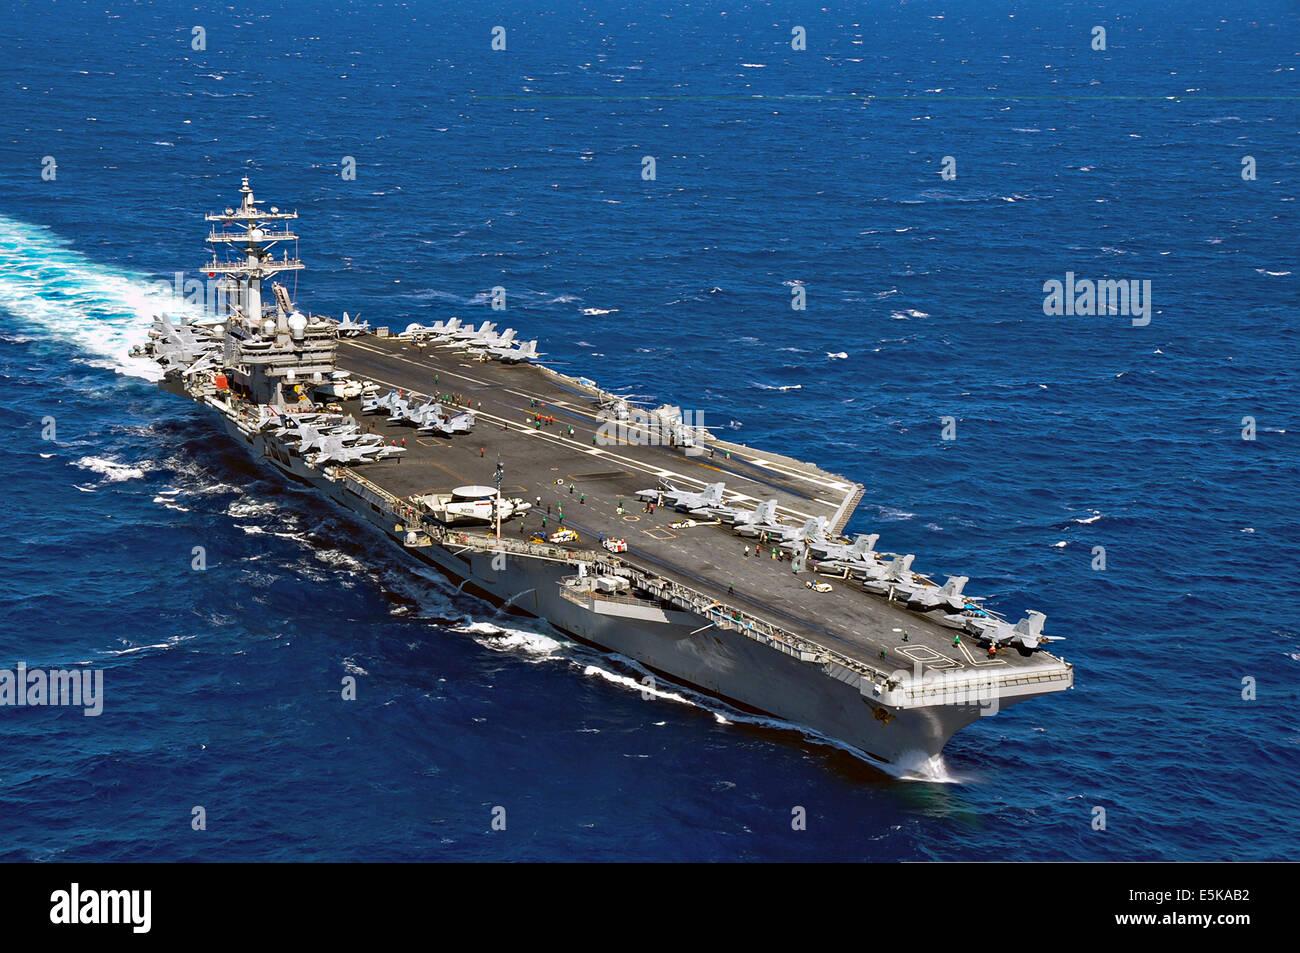 us navy nimitz class nuclear powered supercarrier uss ronald reagan